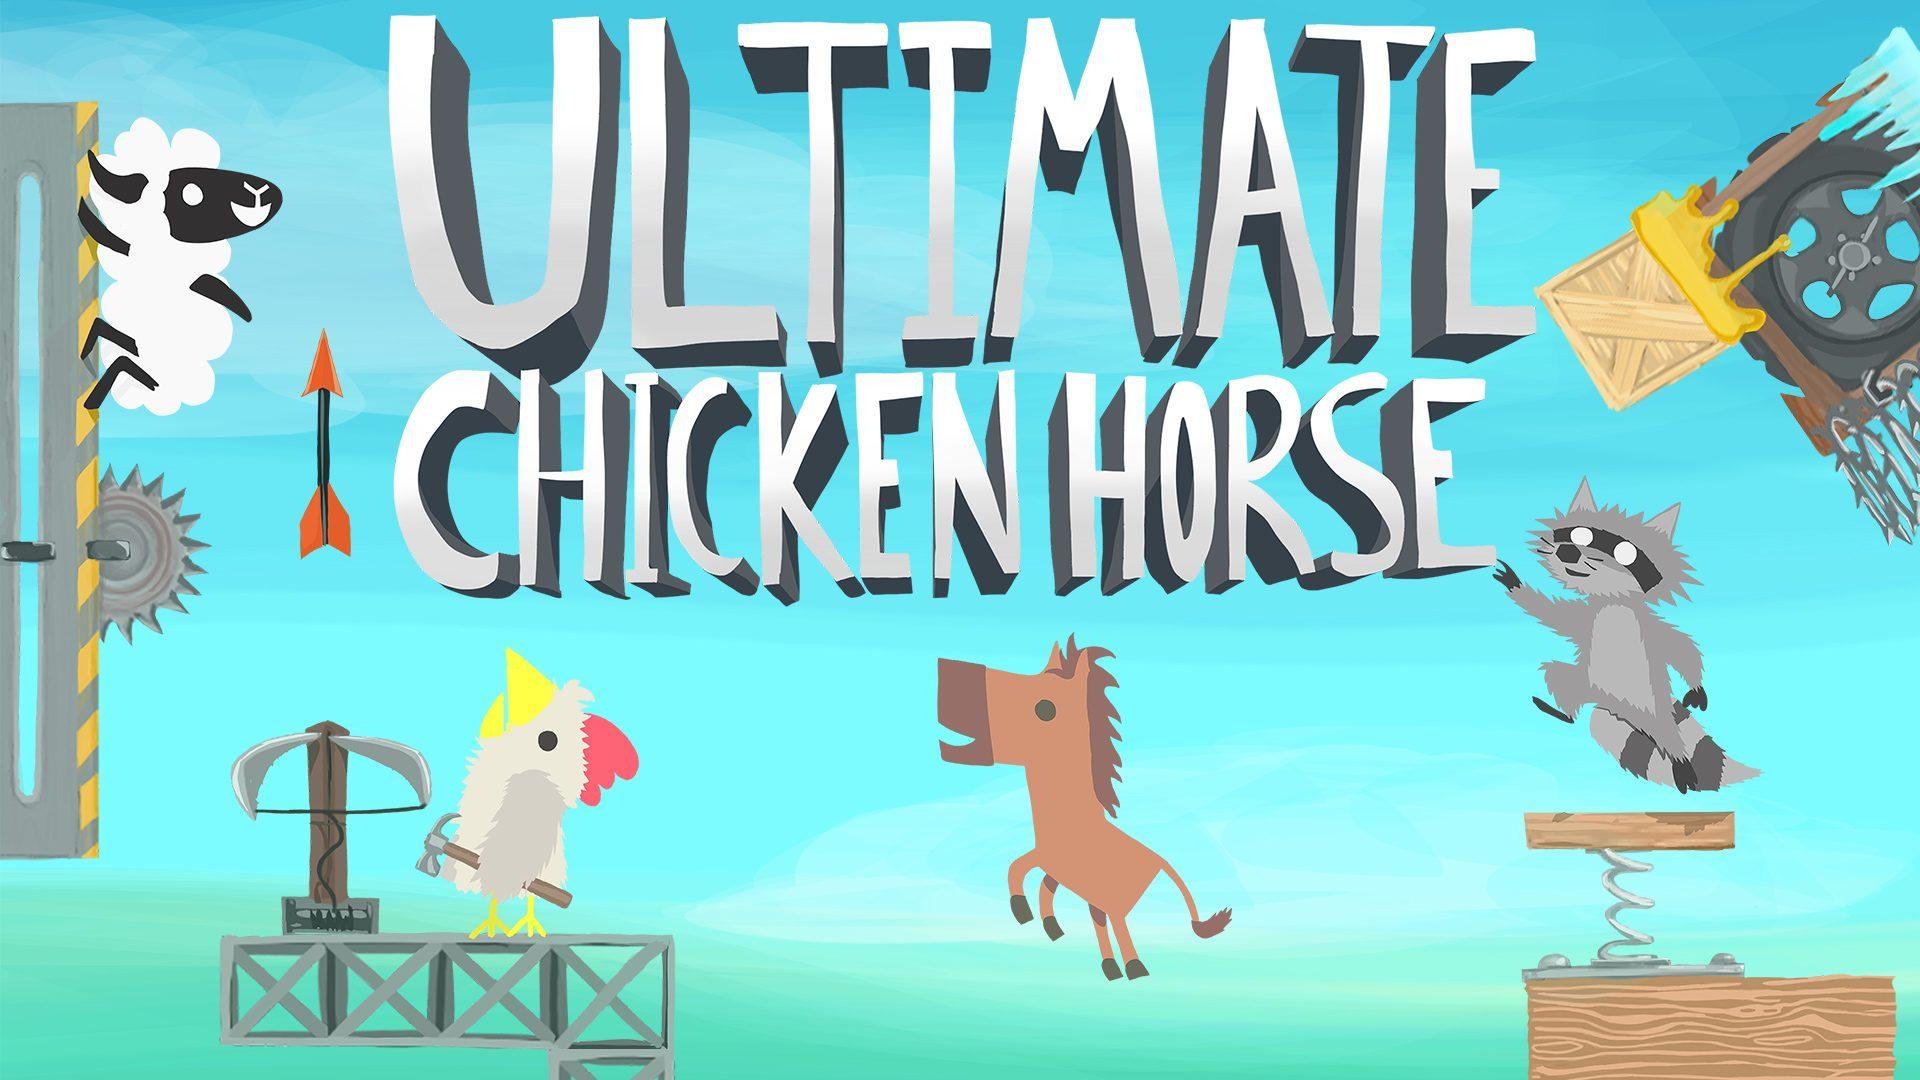 keyart ultimate chicken horse